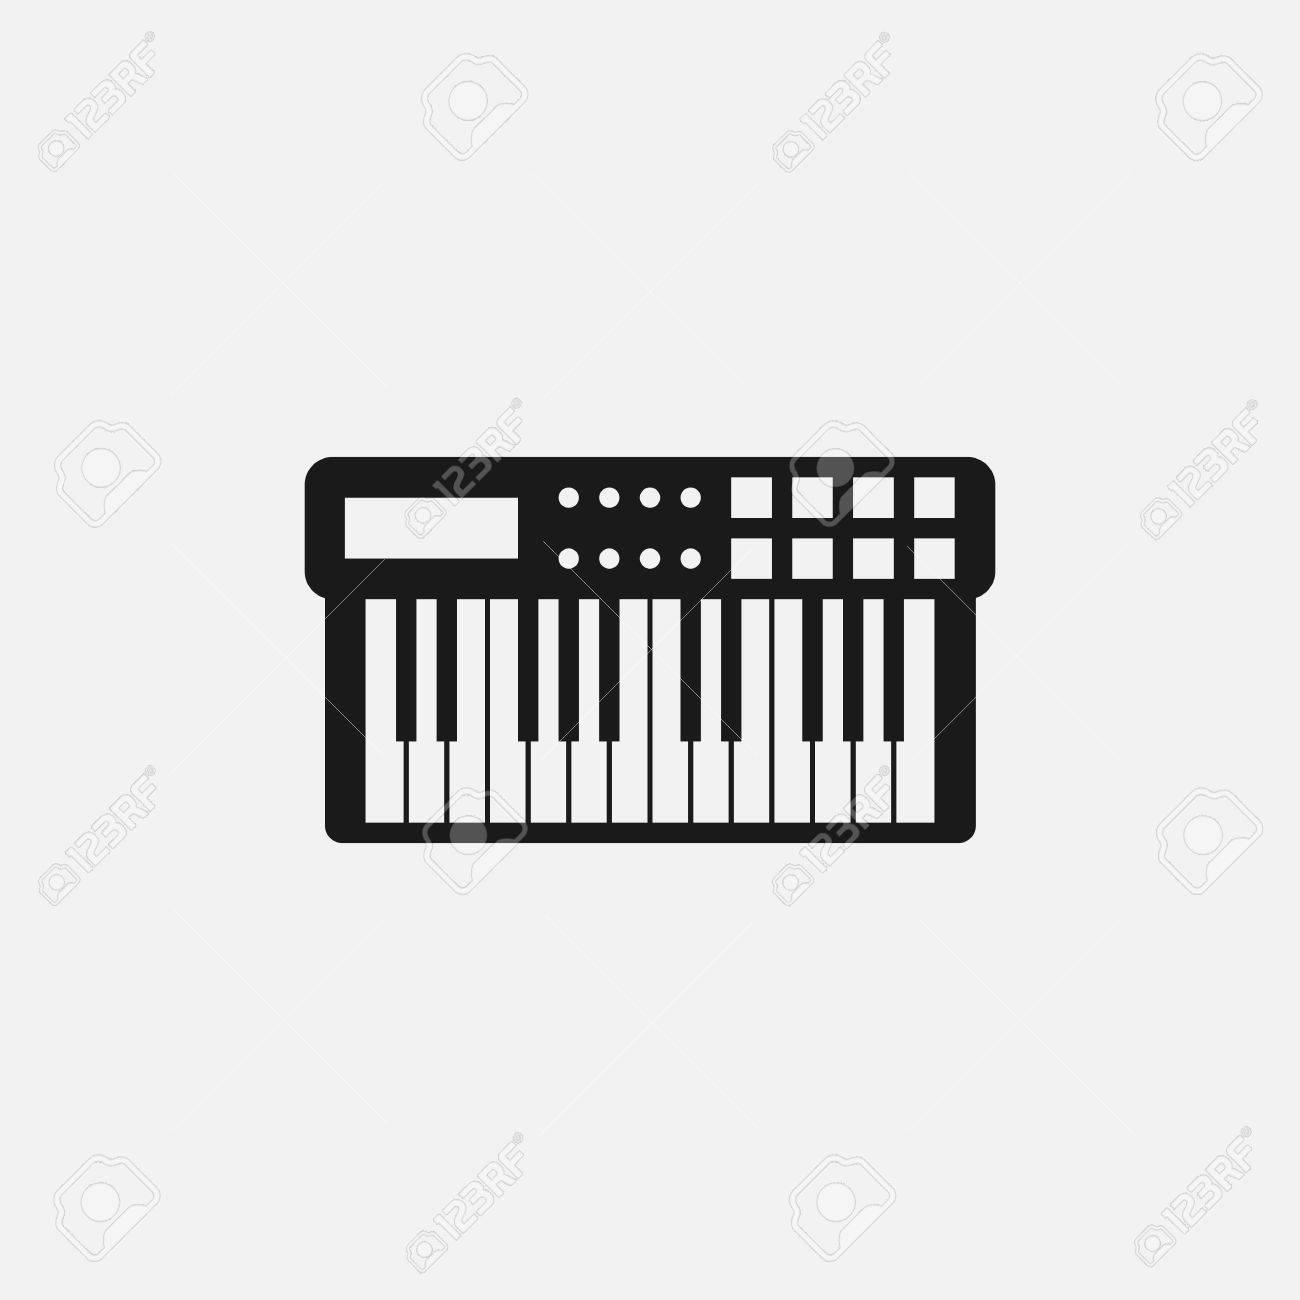 X free clip art. Piano clipart midi keyboard